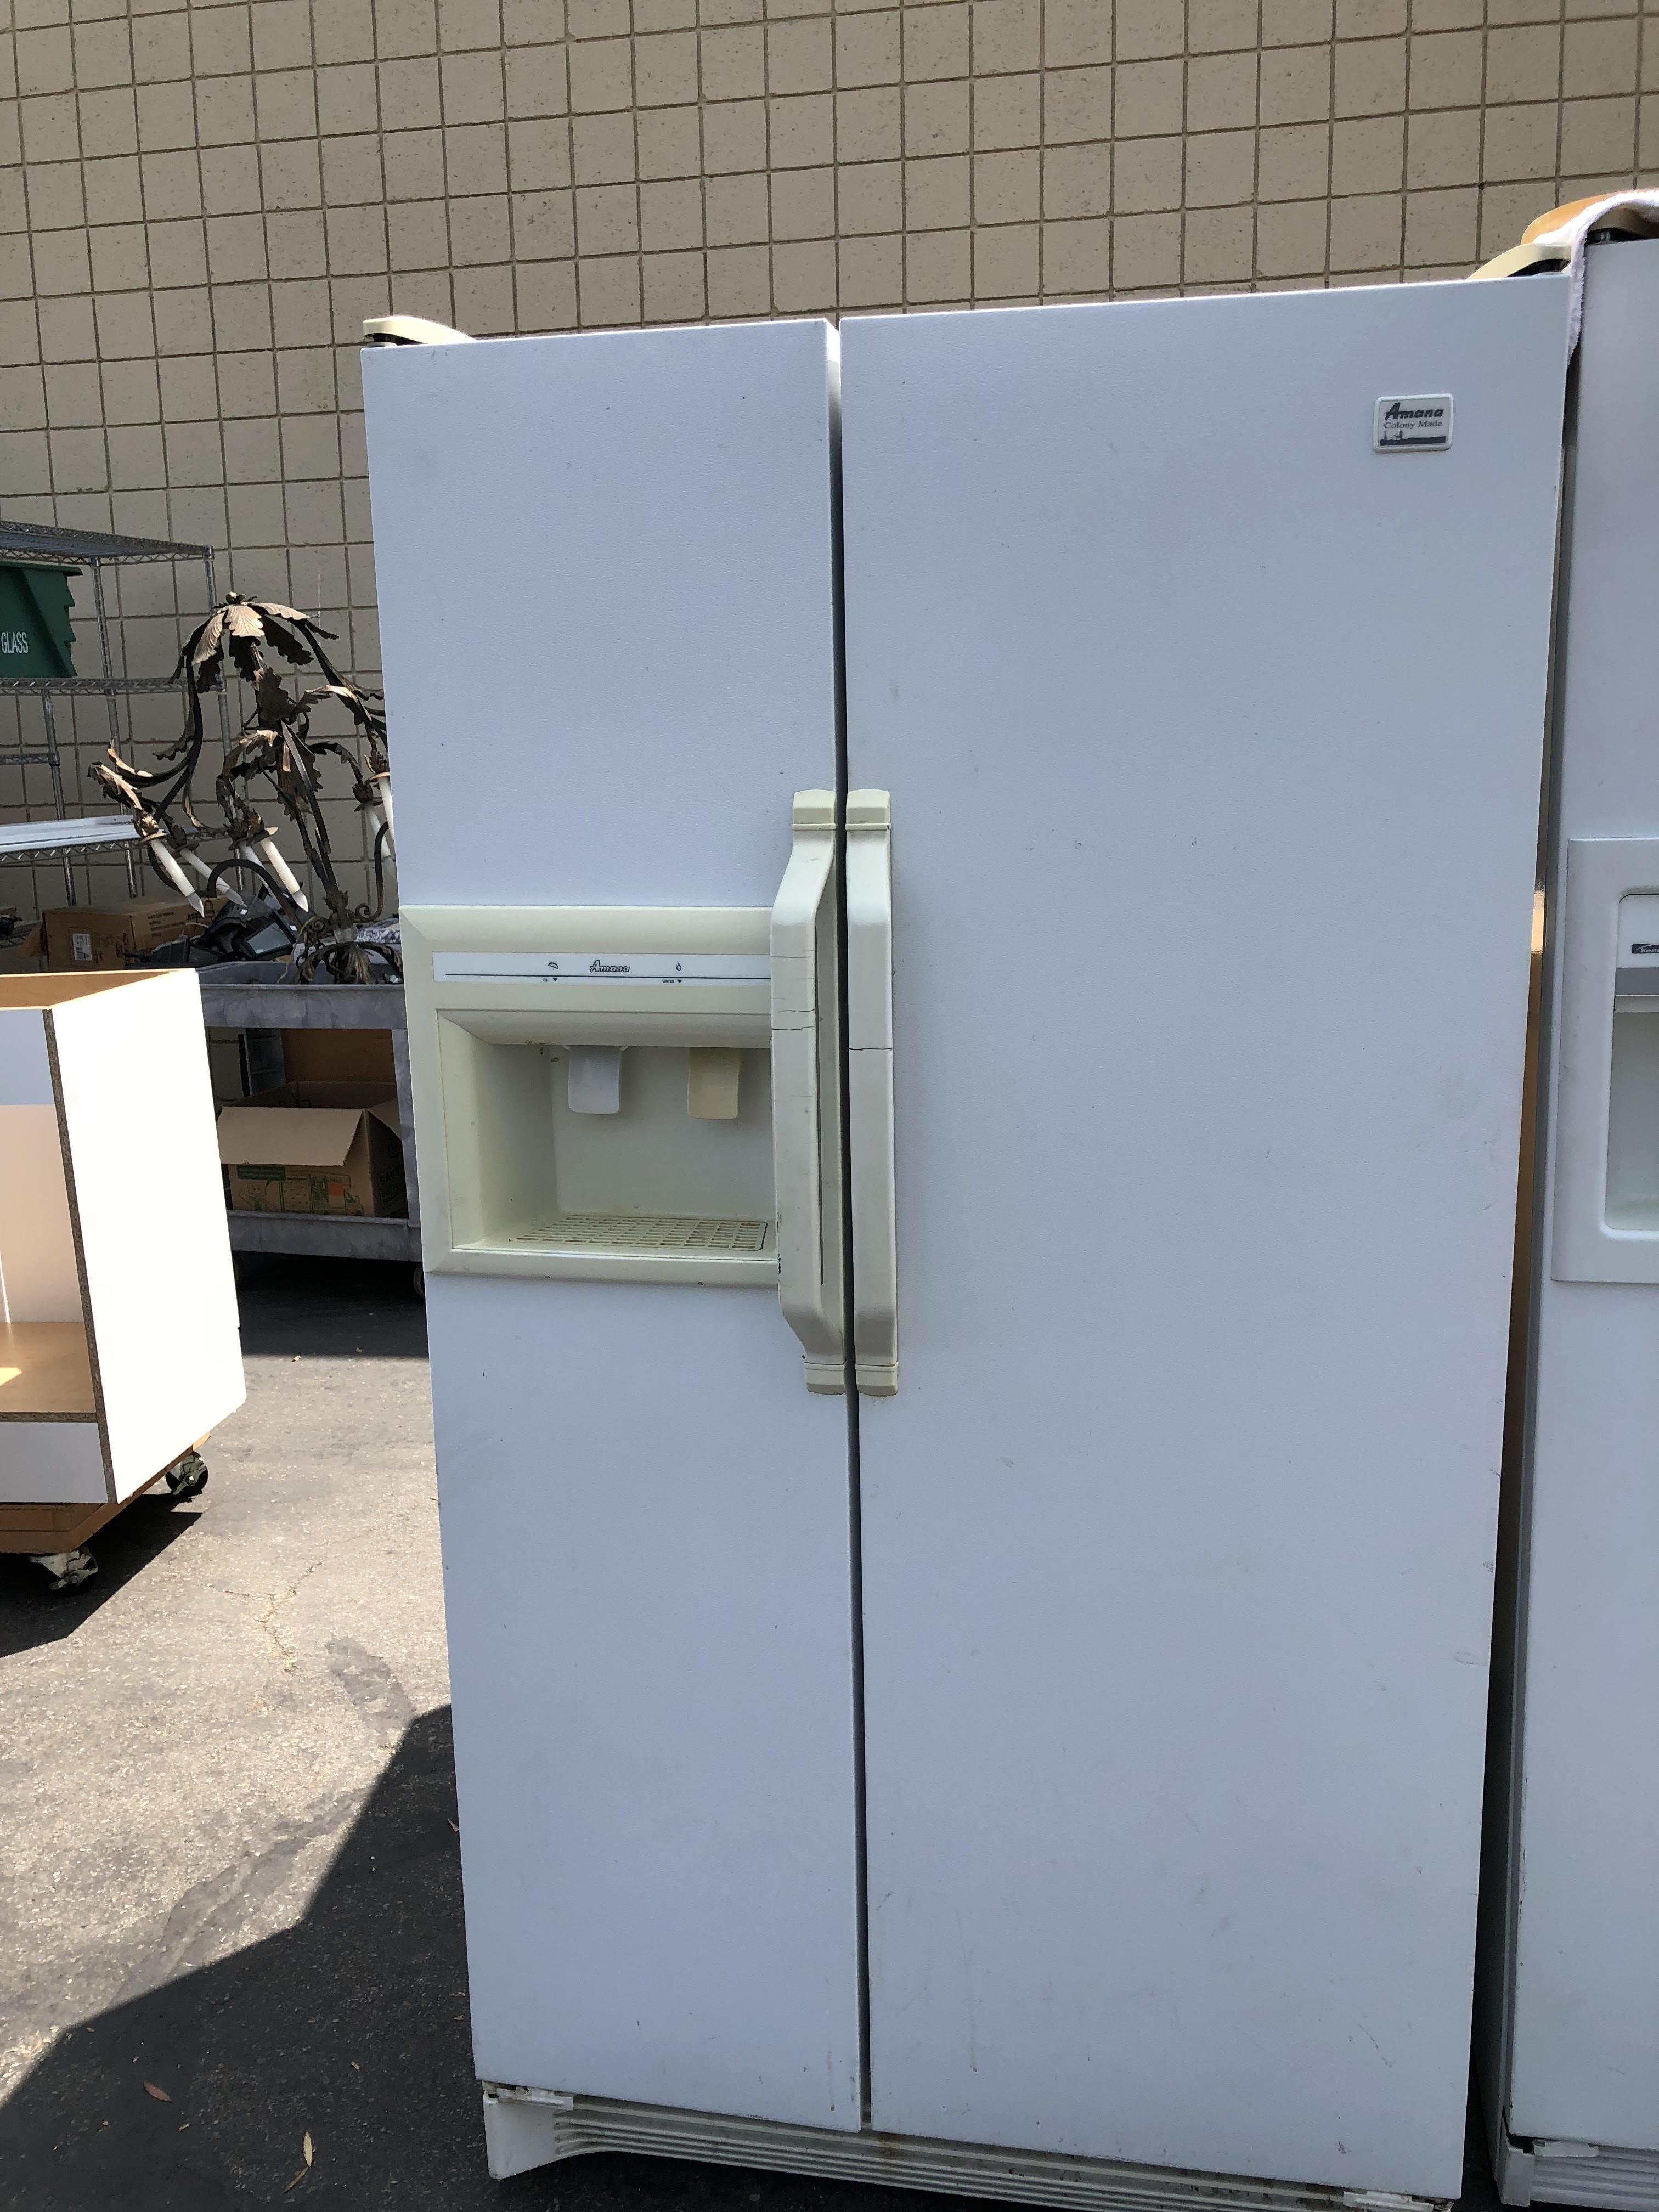 Amana Refrigerator D342 250